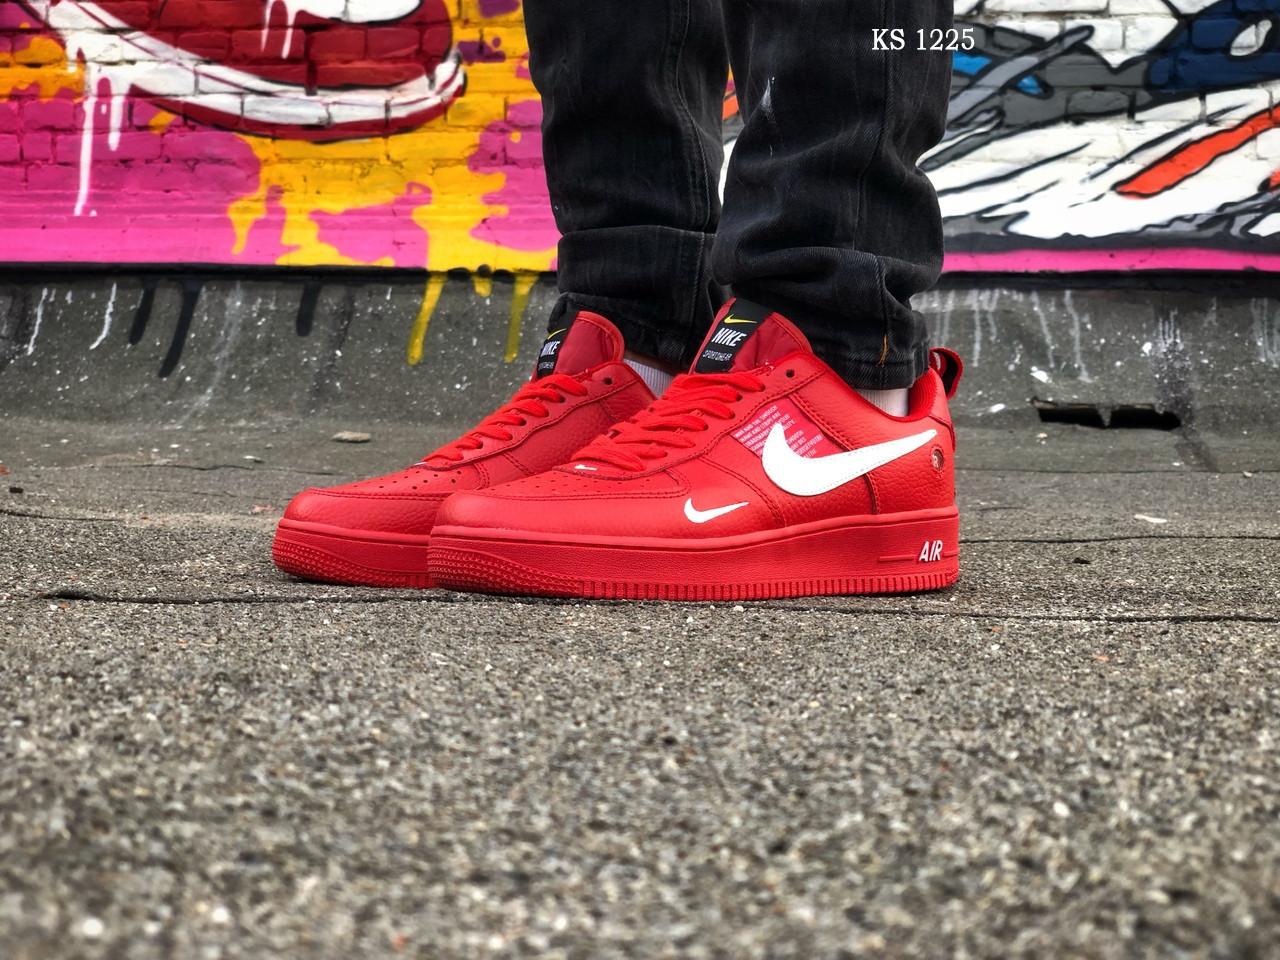 Мужские кроссовки Nike Air Force 1 LV8 (красно/белые)